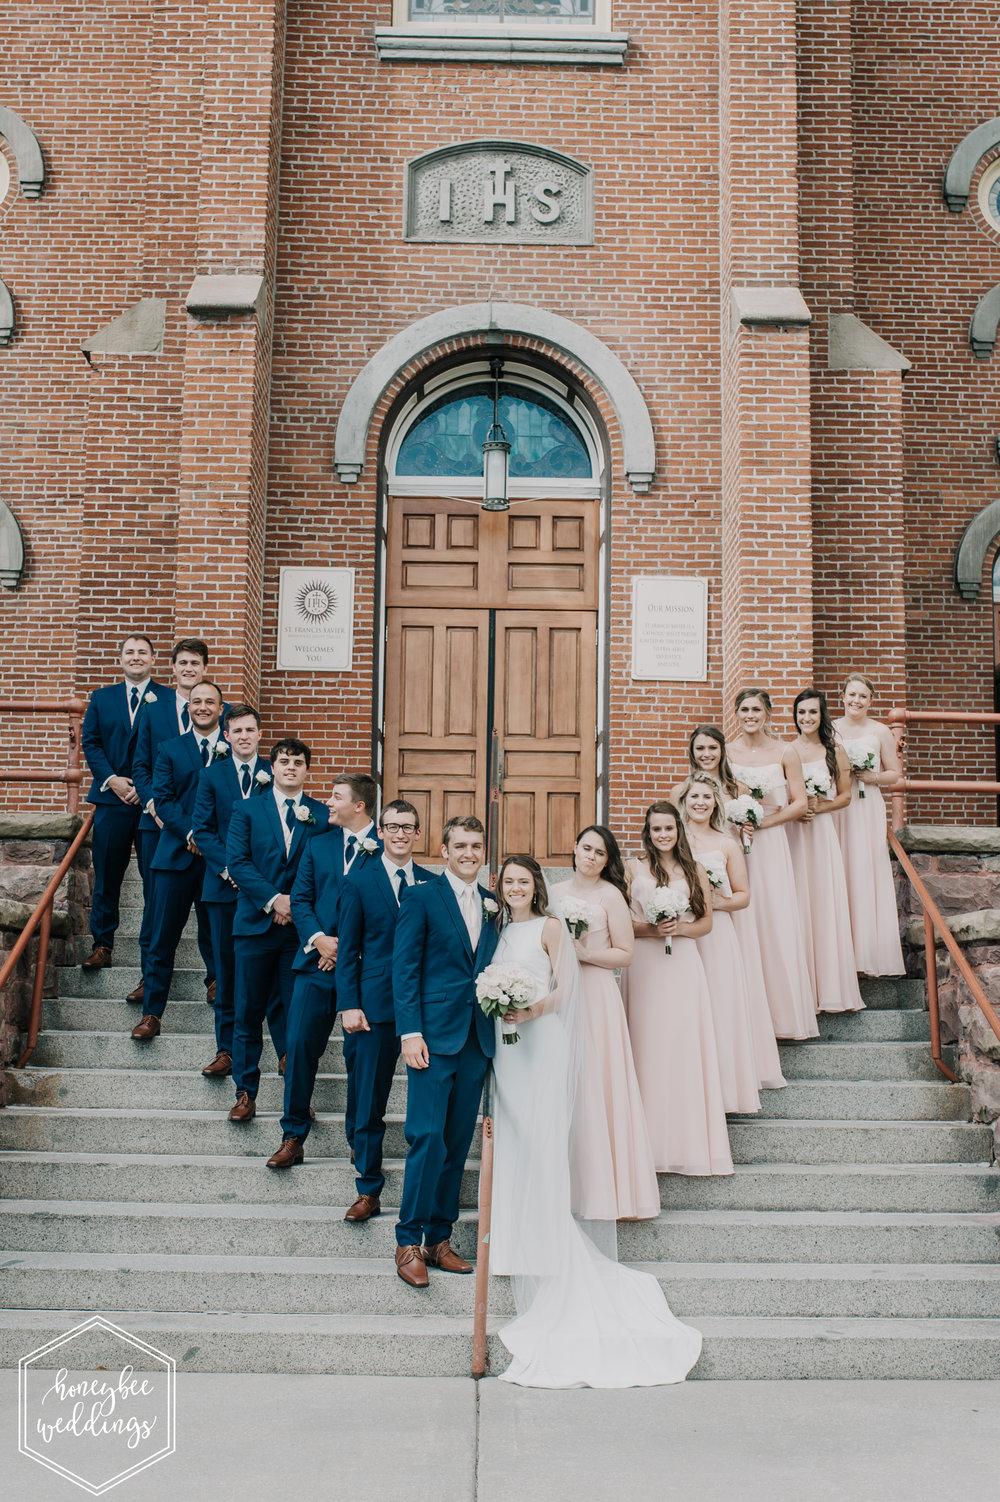 170 Montana Wedding Photographer_St. Francis Wedding_Tifani Zanto + Ryan Burke -6730.jpg